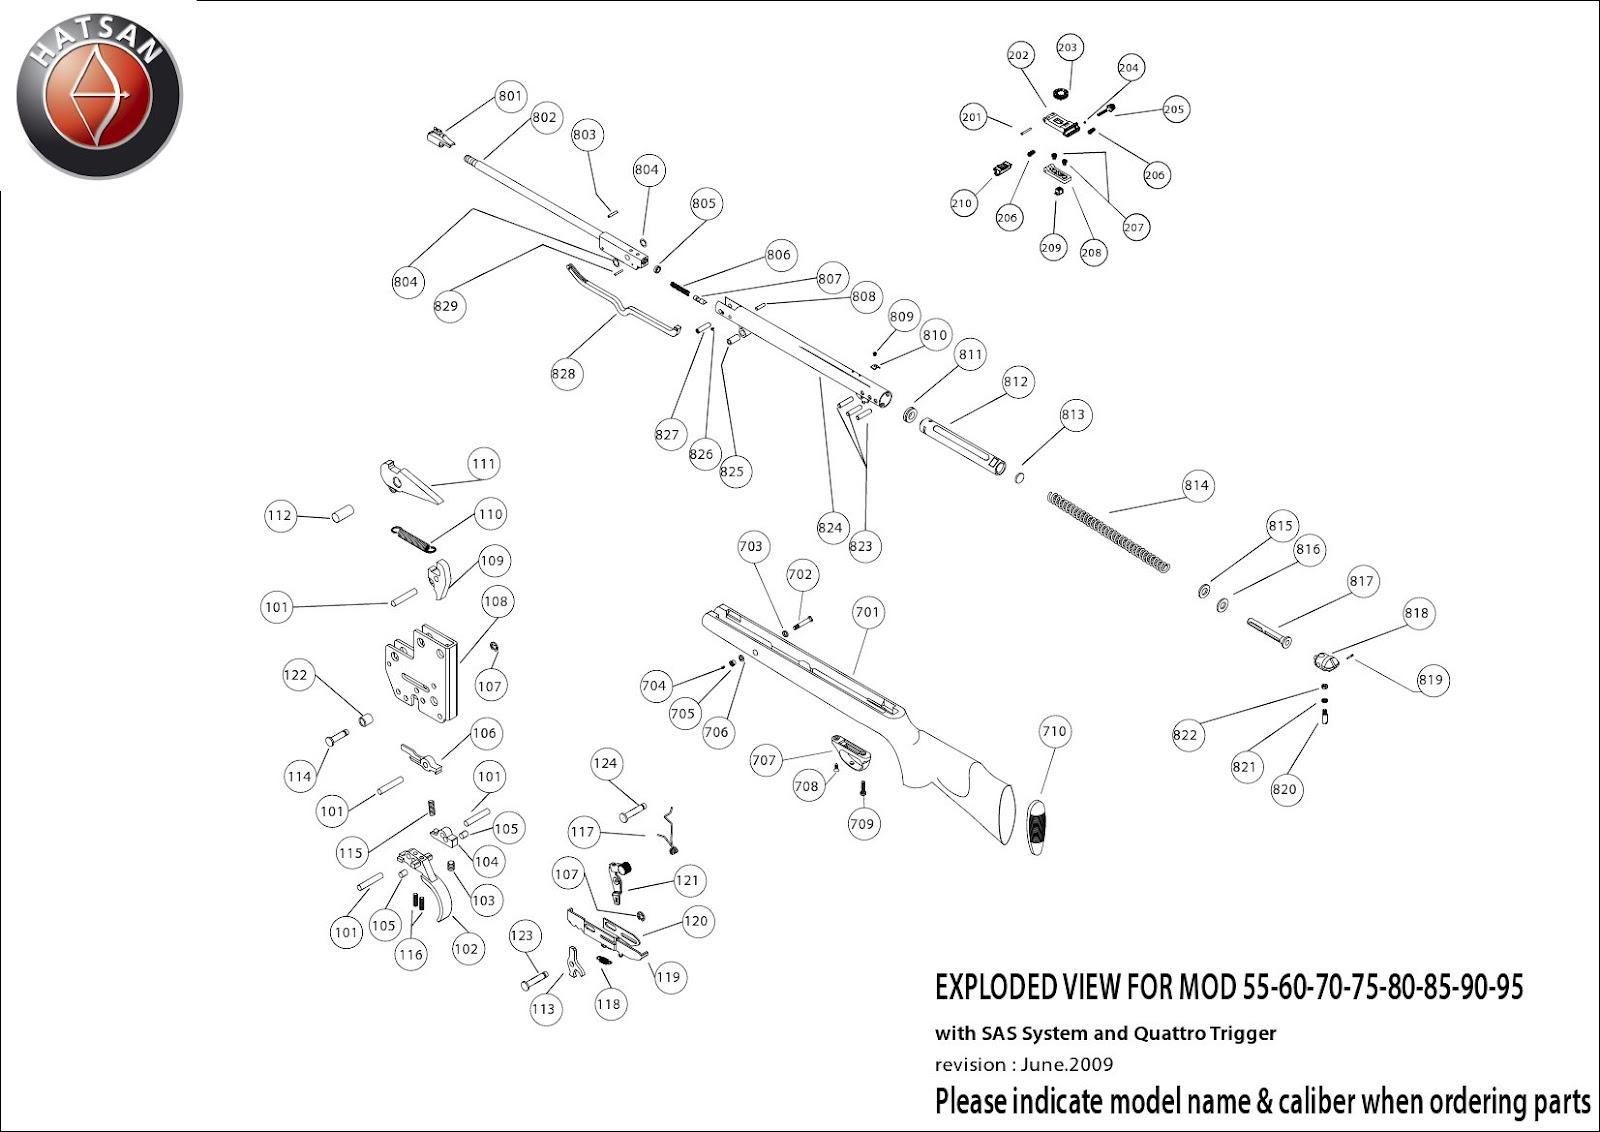 muzzleloader parts diagram flintlock parts diagram thompson center hawken replacement parts thompson center flintlocks schematics [ 1600 x 1132 Pixel ]